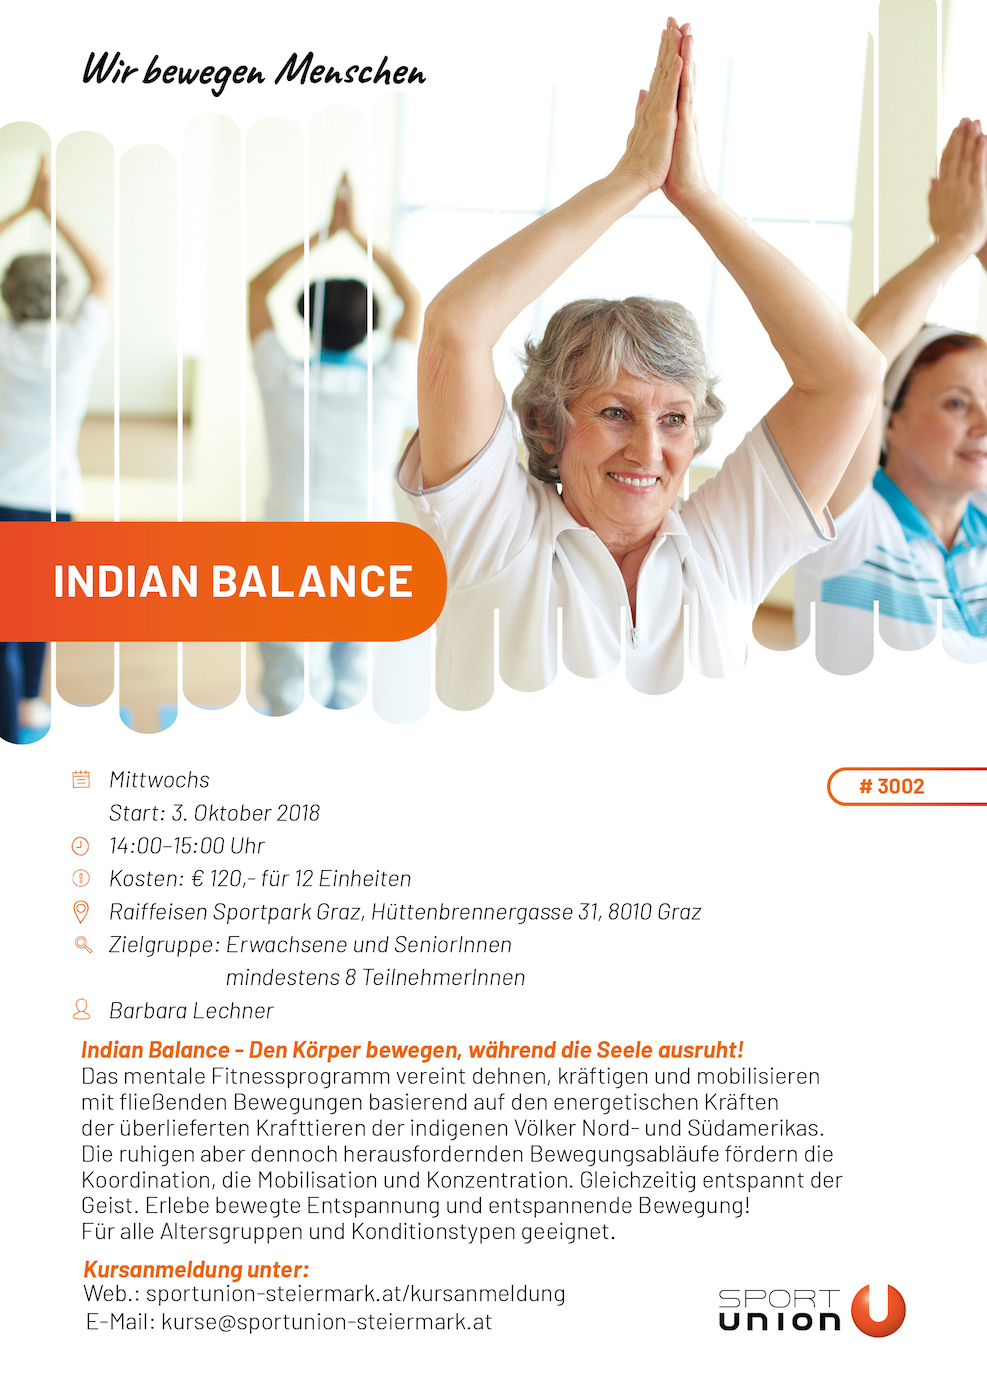 Indian Balance - Raiffeisen Sportpark